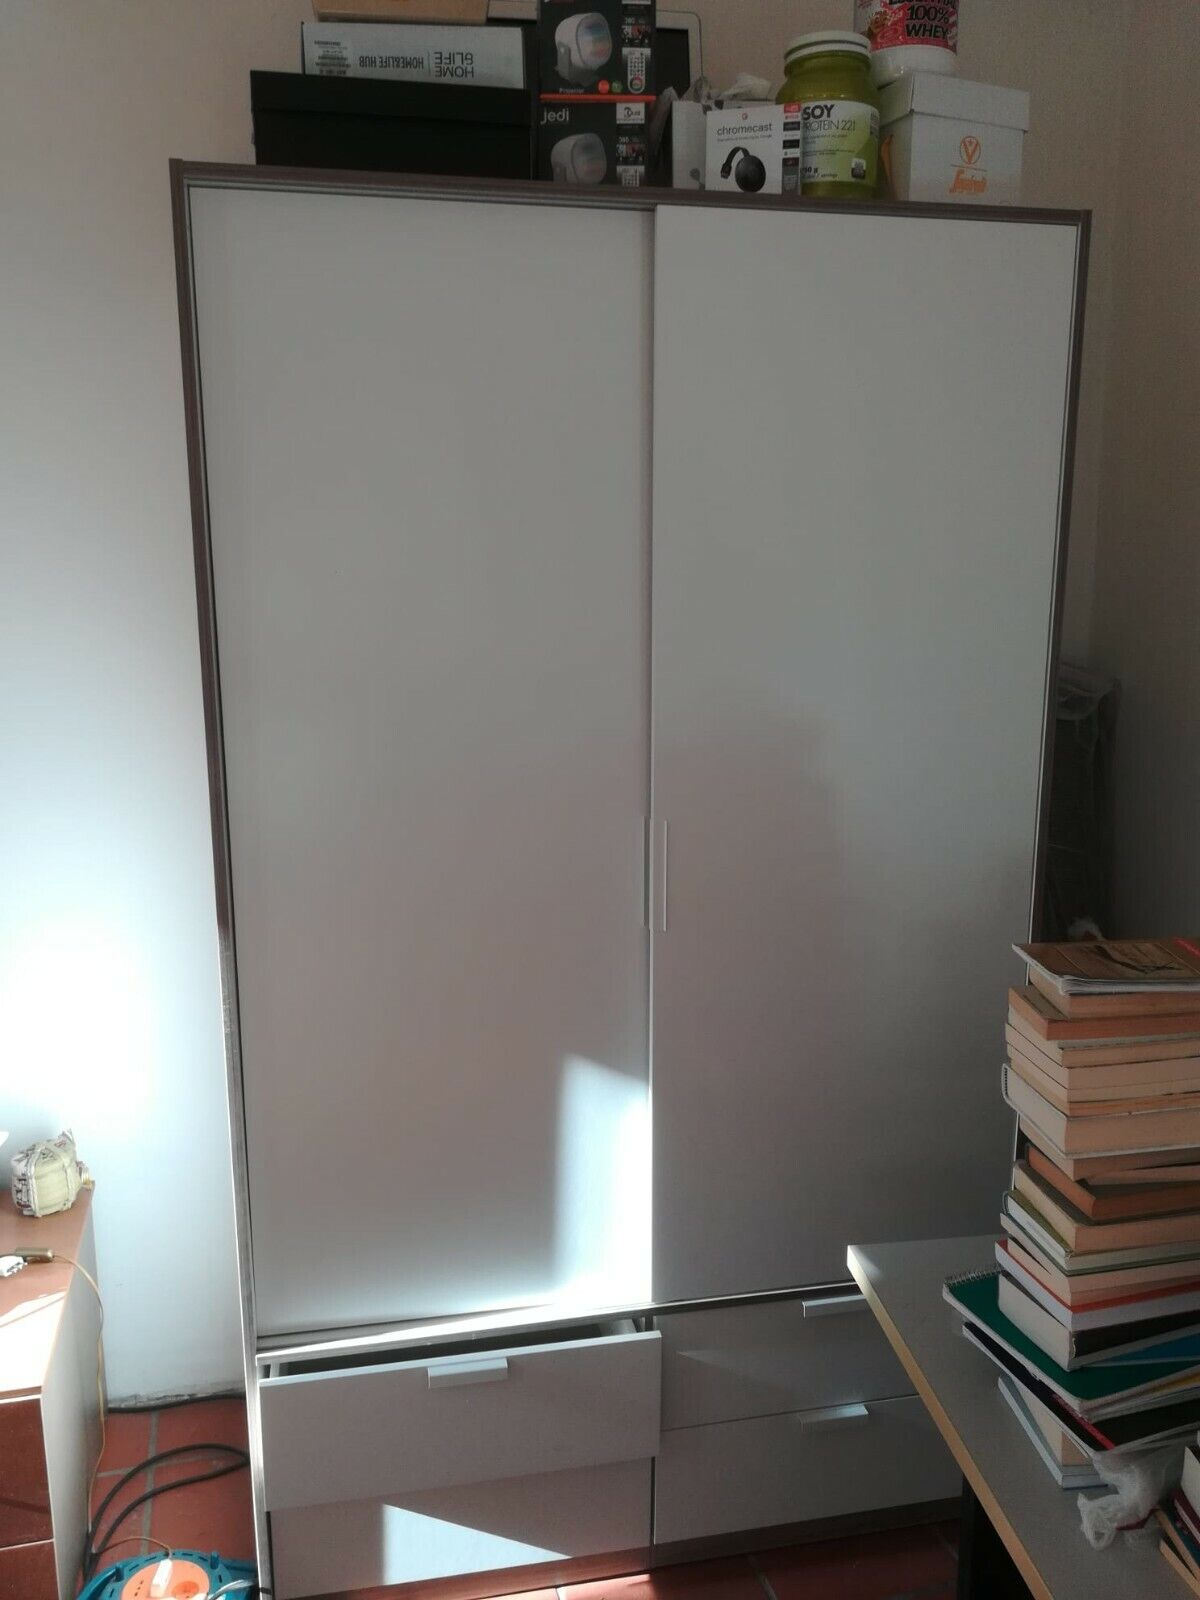 Armadio Ante Scorrevoli Ikea Usato.Armadio Ikea Annunci Lombardia Kijiji Annunci Di Ebay